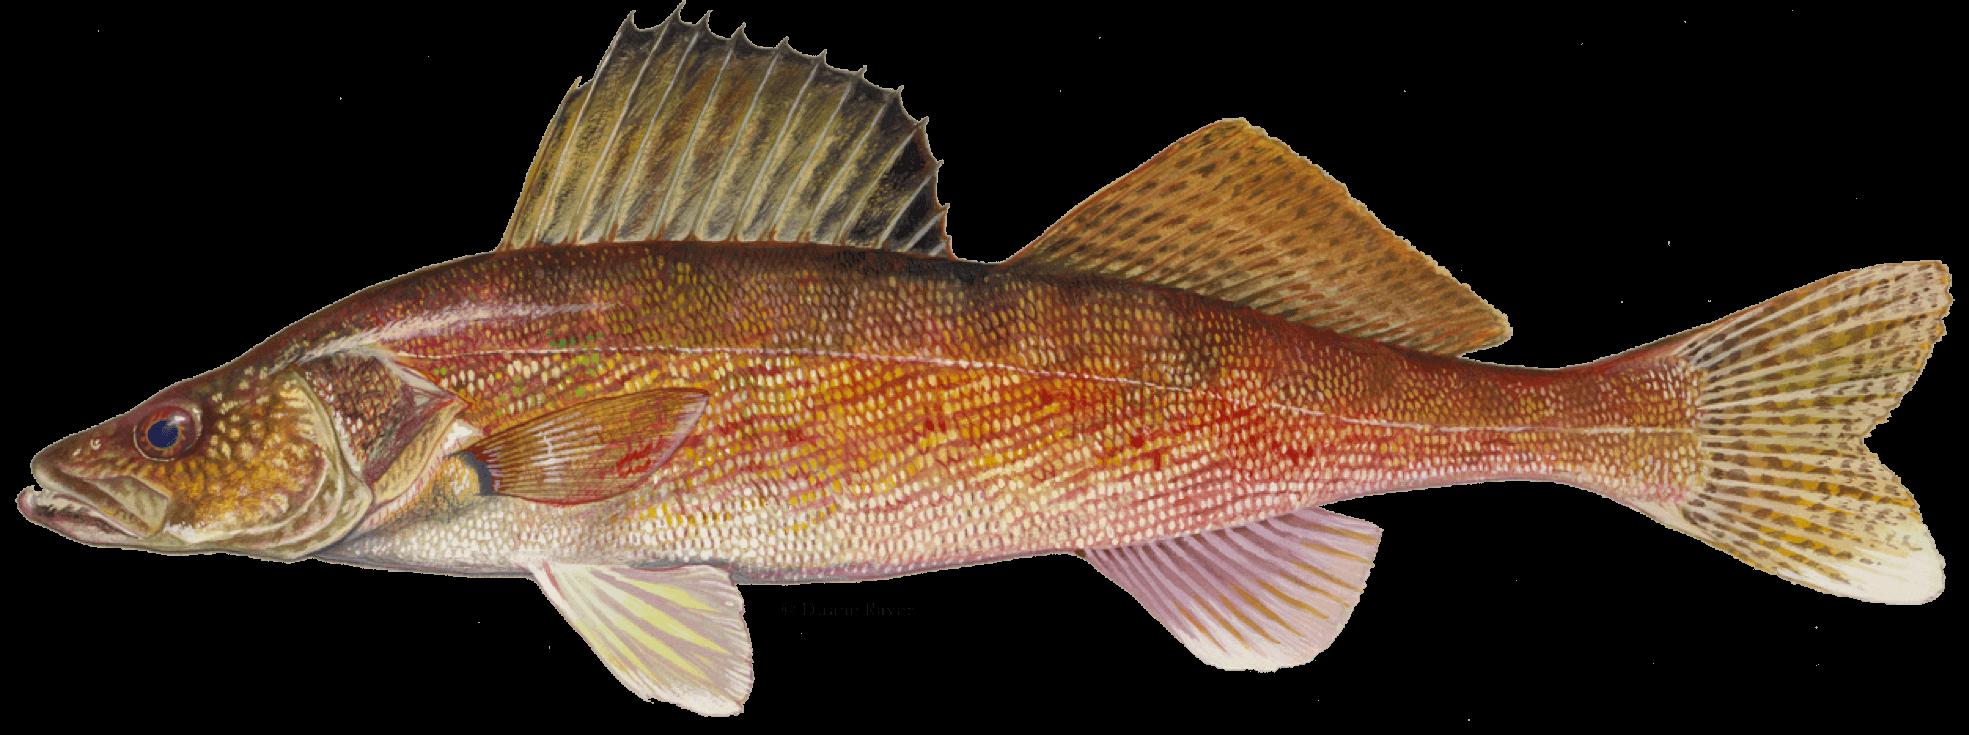 How-to-Catch-Walleye-Fishing-Guide